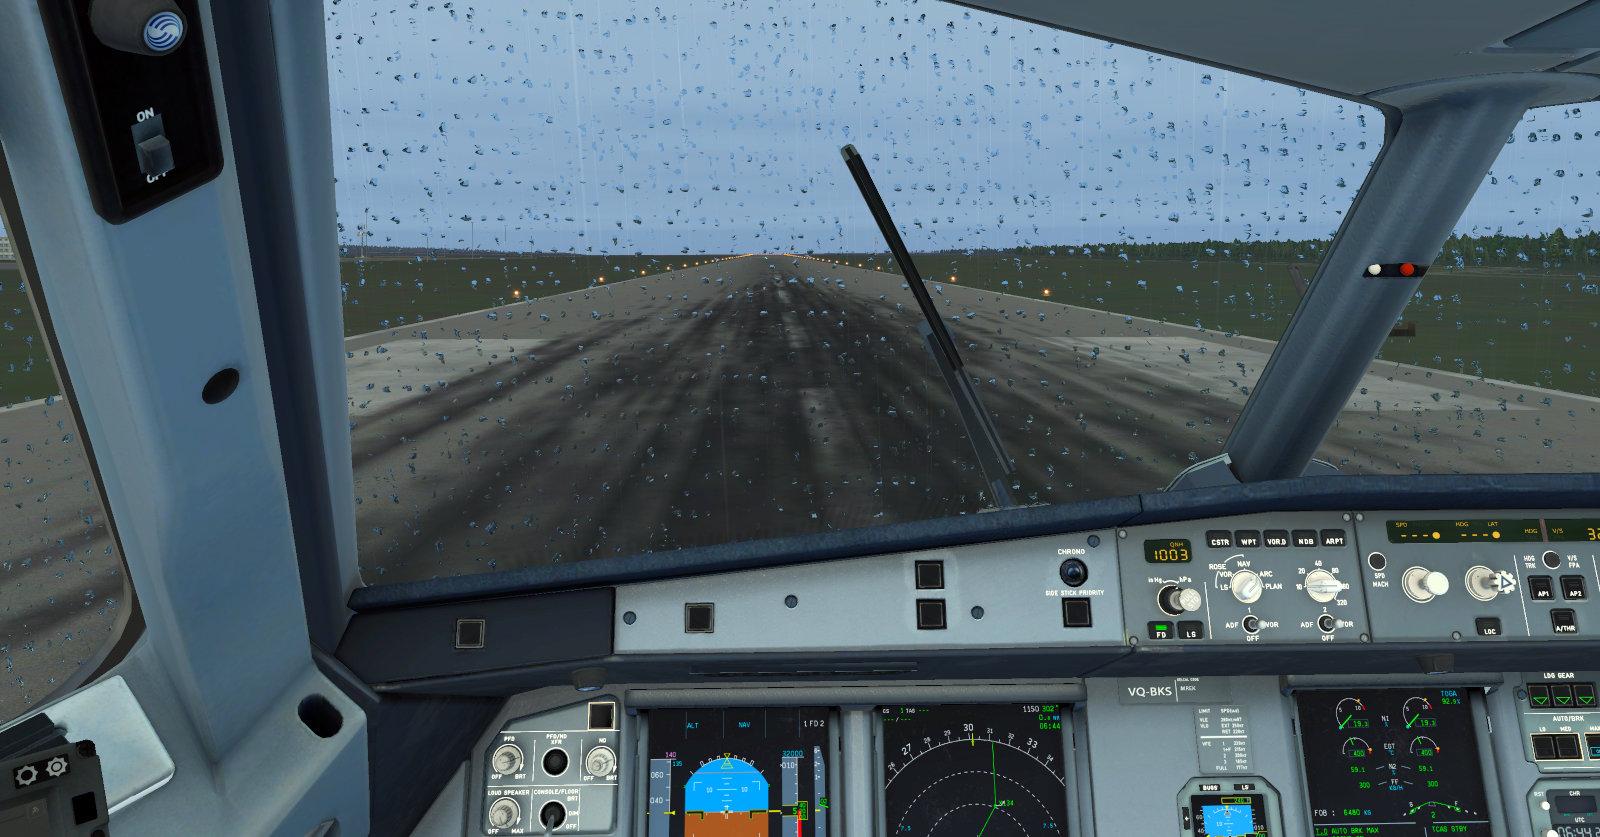 rain.jpg.6c7fa721adbec569fe06735d415c5860.jpg